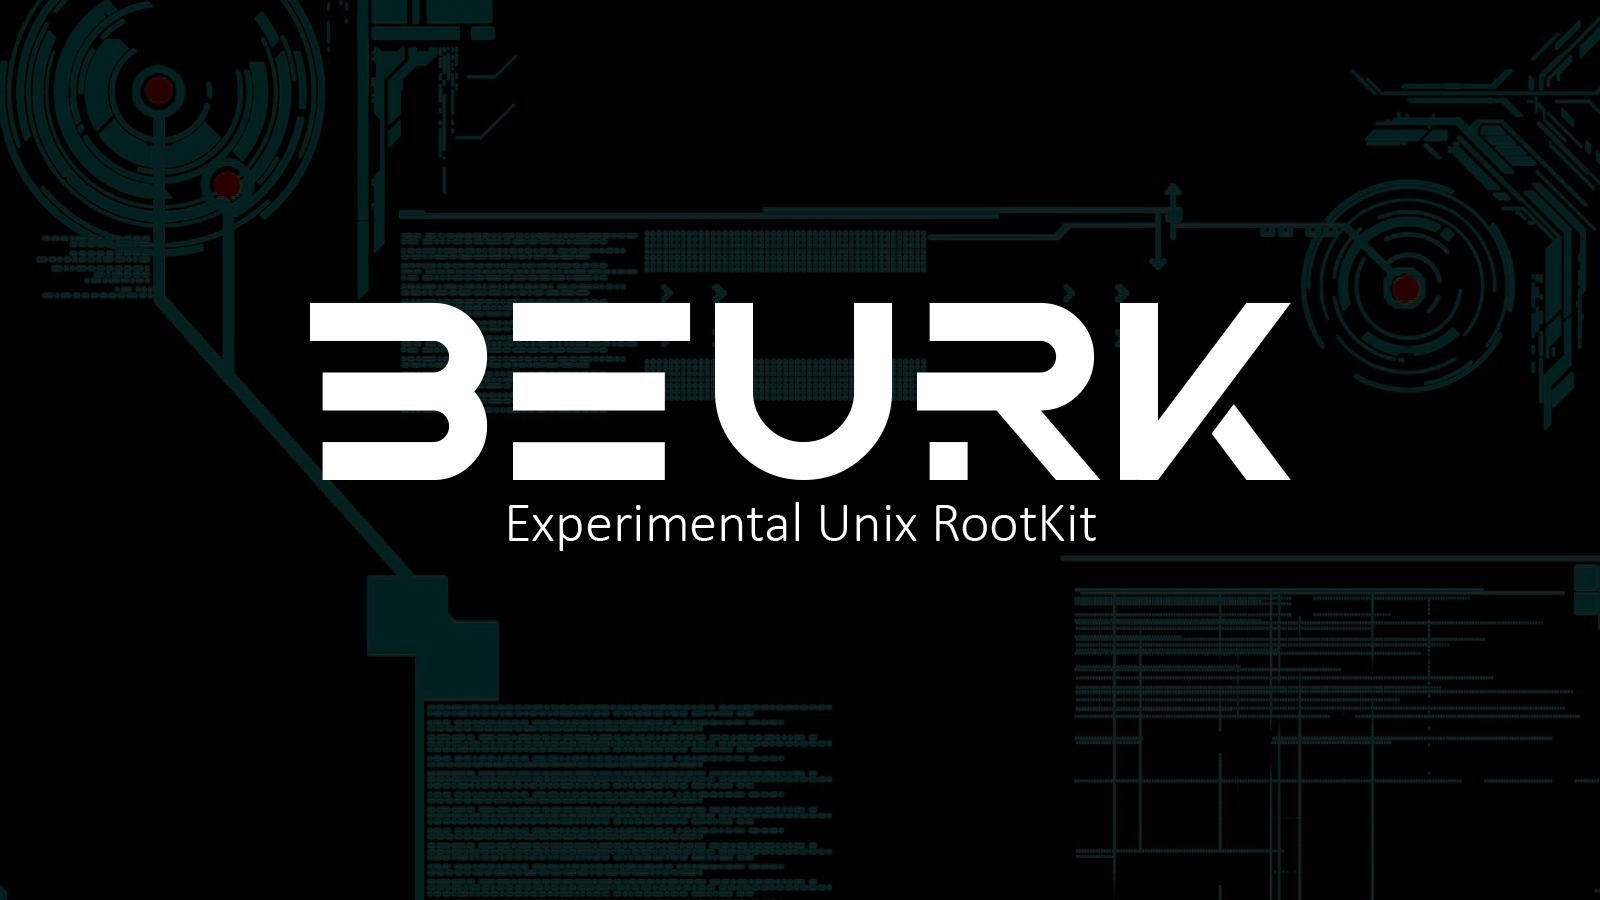 BEURK - Experimental Unix RootKit